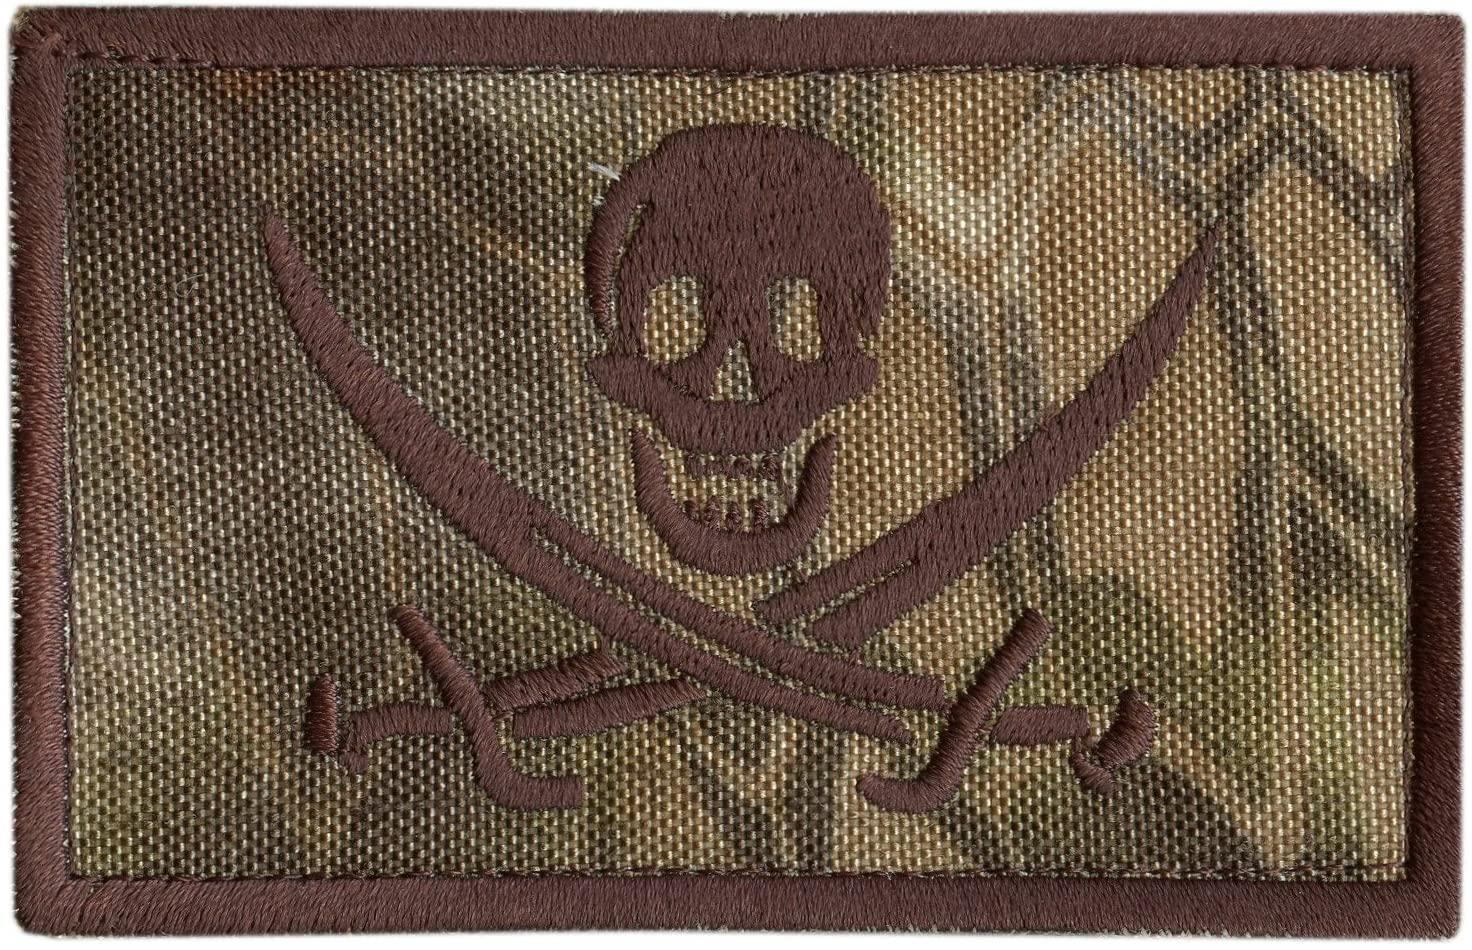 LEGEEON Kryptek Highlander Calico Jack Skull Pirate Jolly Roger Morale ISAF Sew Iron on Patch